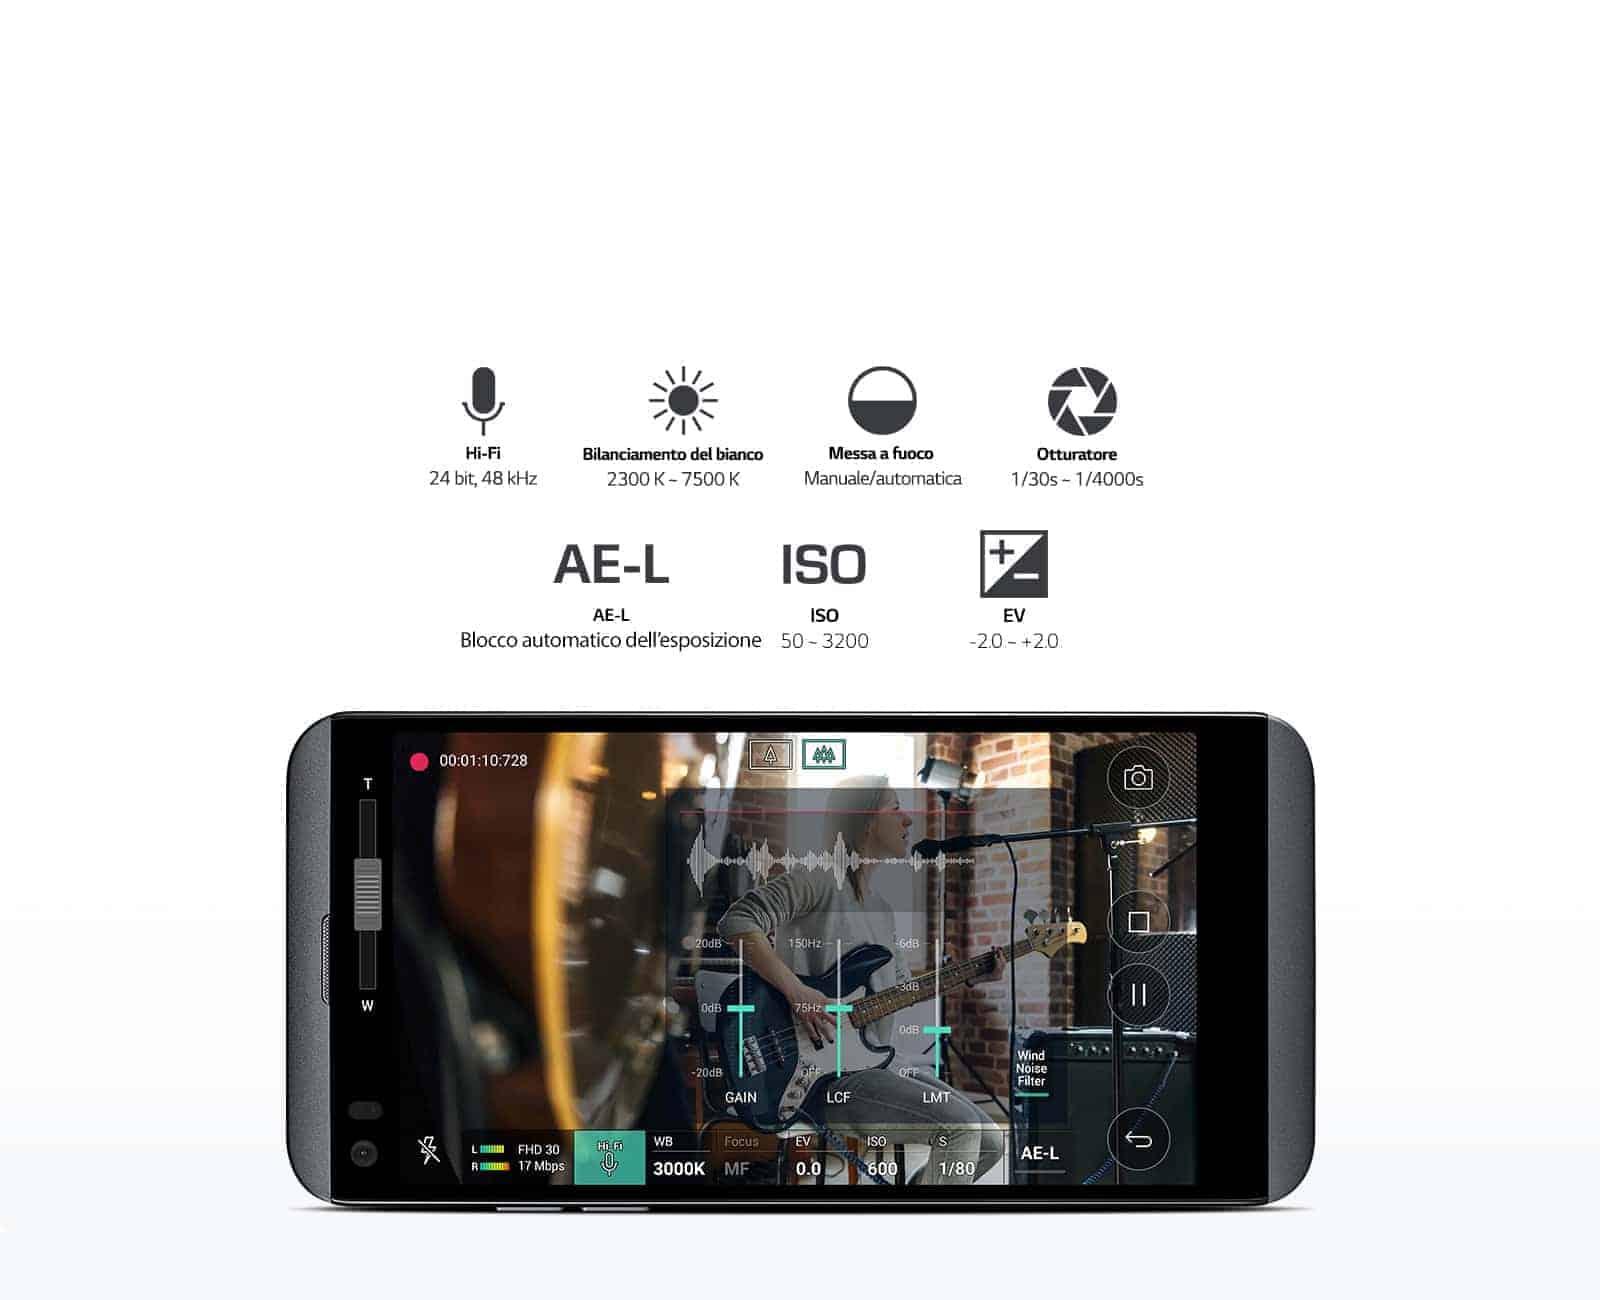 04 Q8 Manual video mode 18072017 D